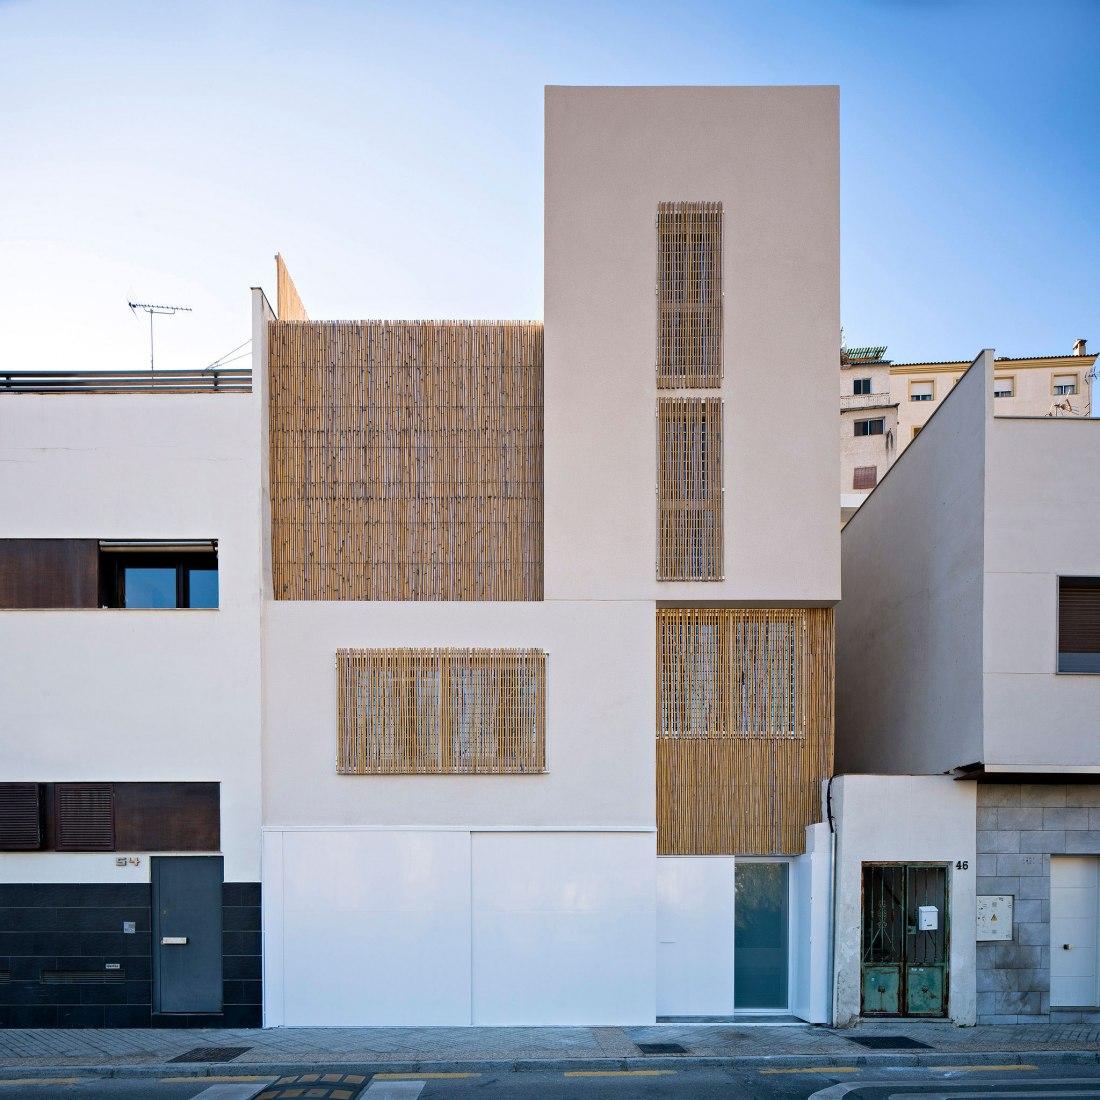 Exterior view. Casa Guarnón por Fresneda&Zamora. Fotografía por Javier Callejas